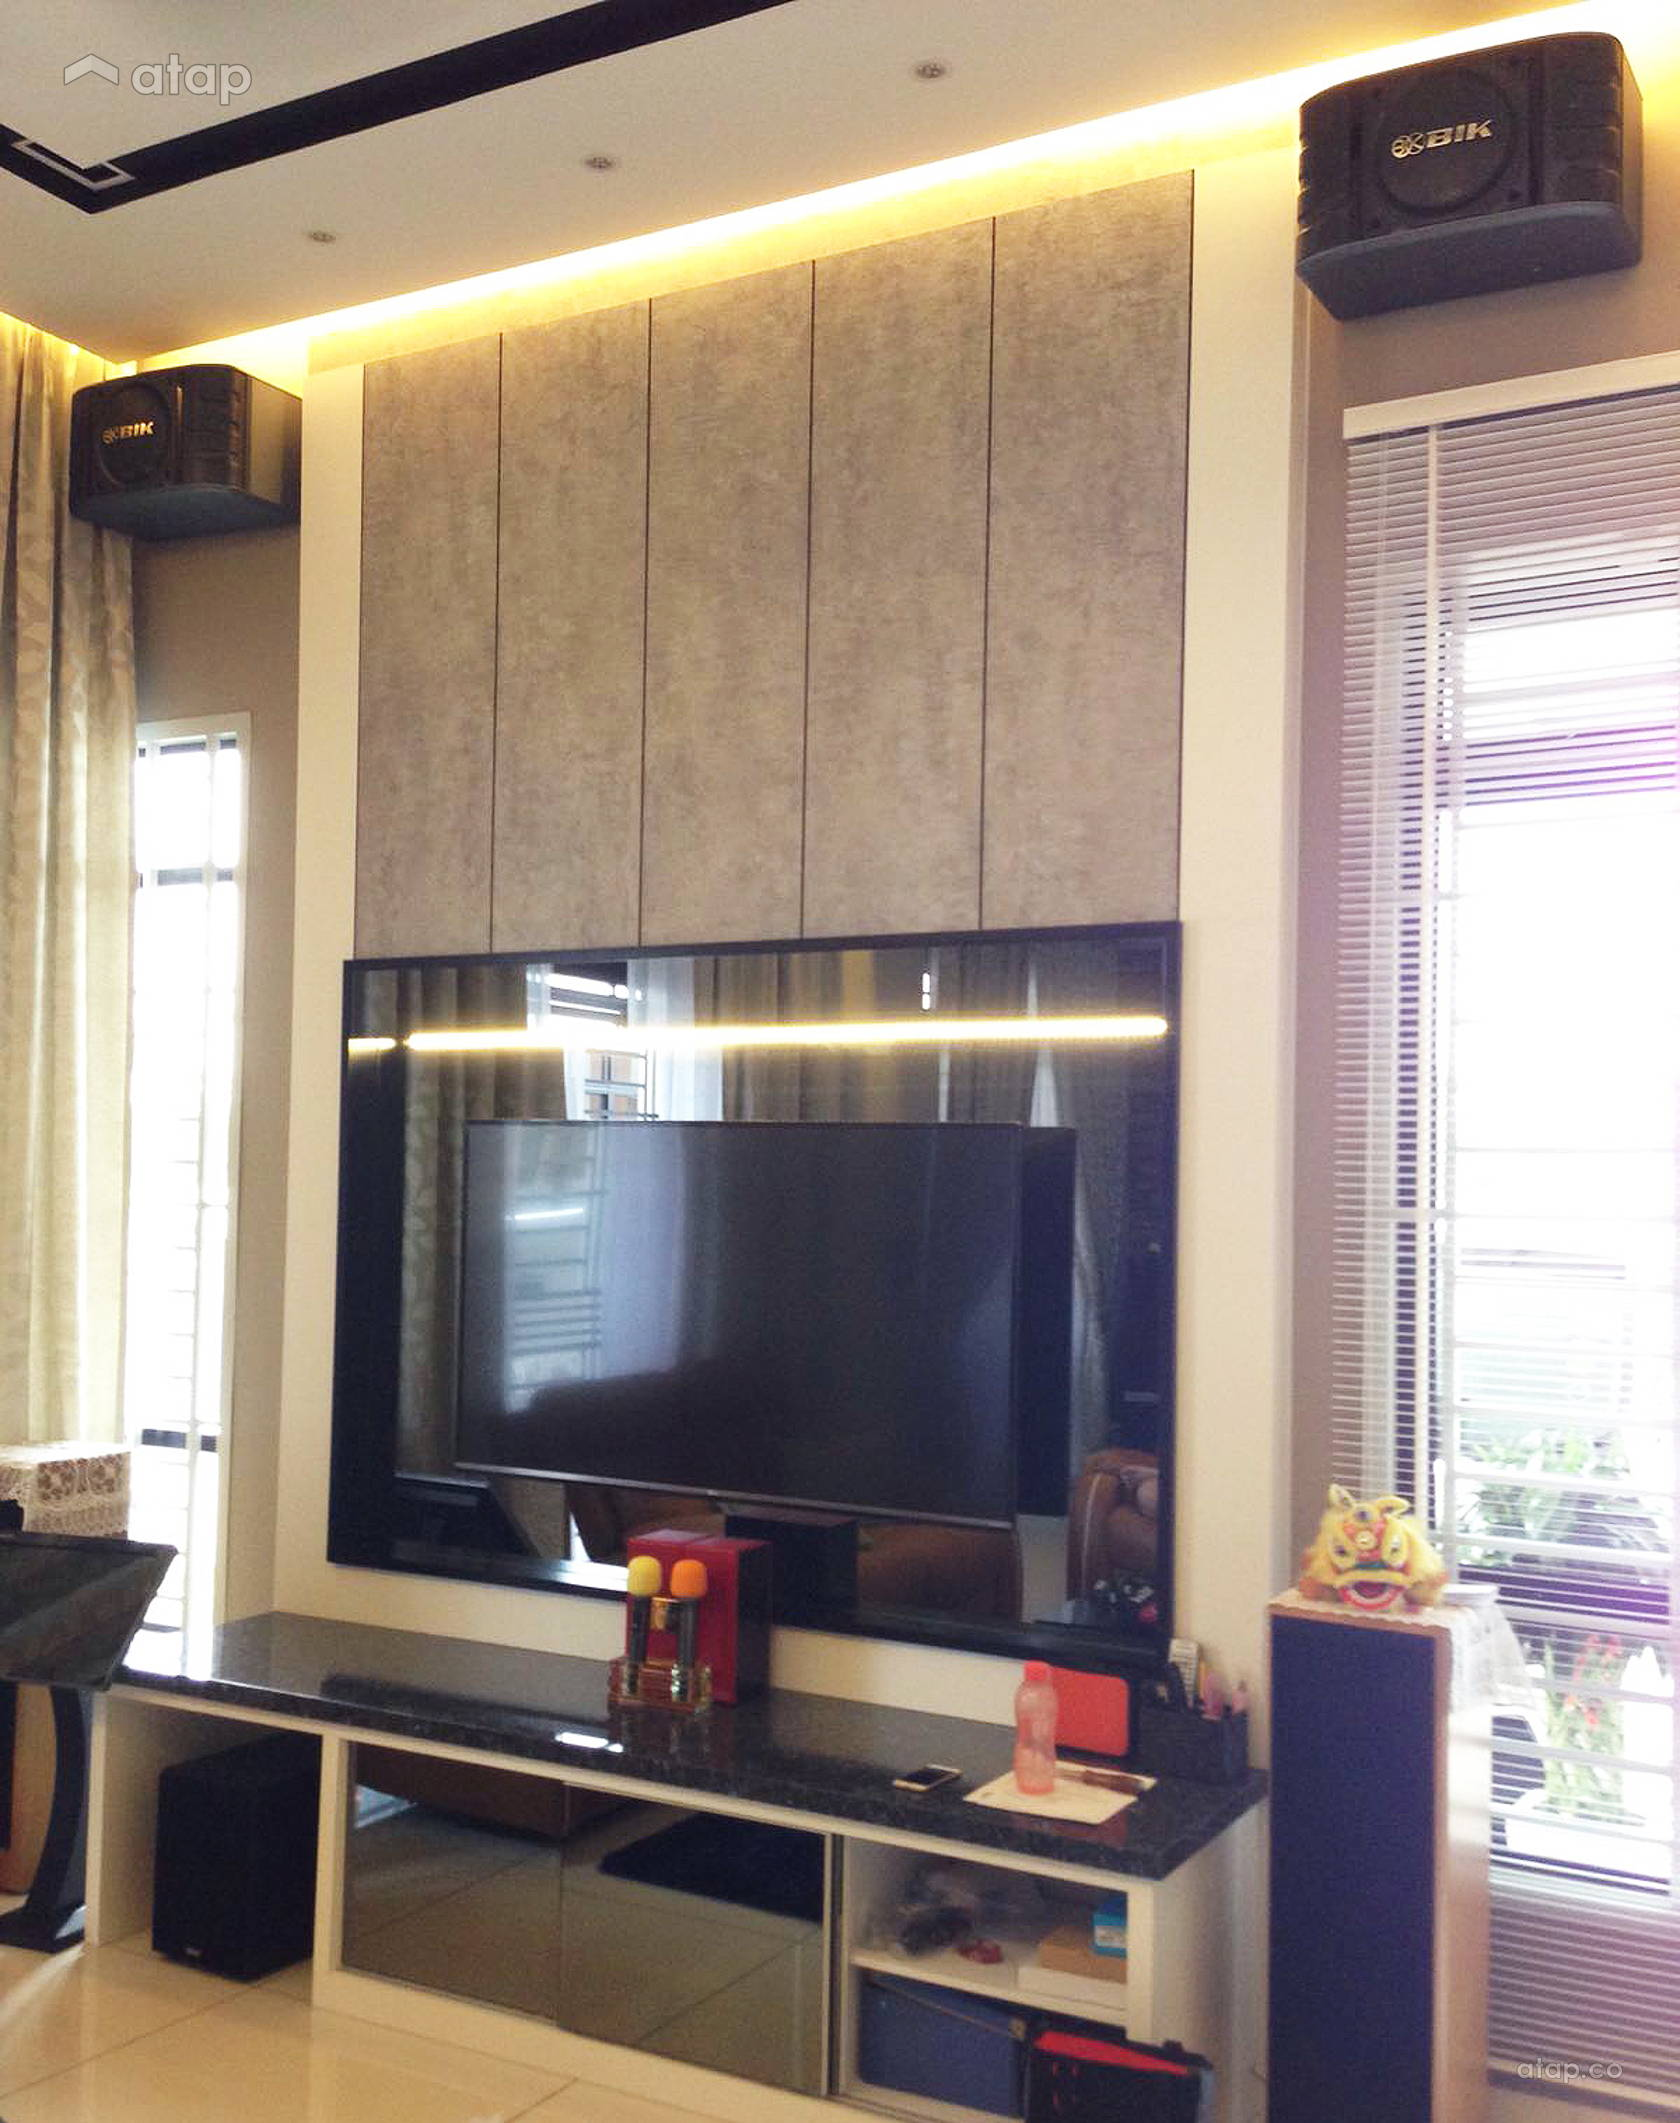 Home Design Ideas Malaysia: Classic Modern Living Room Semi-detached Design Ideas